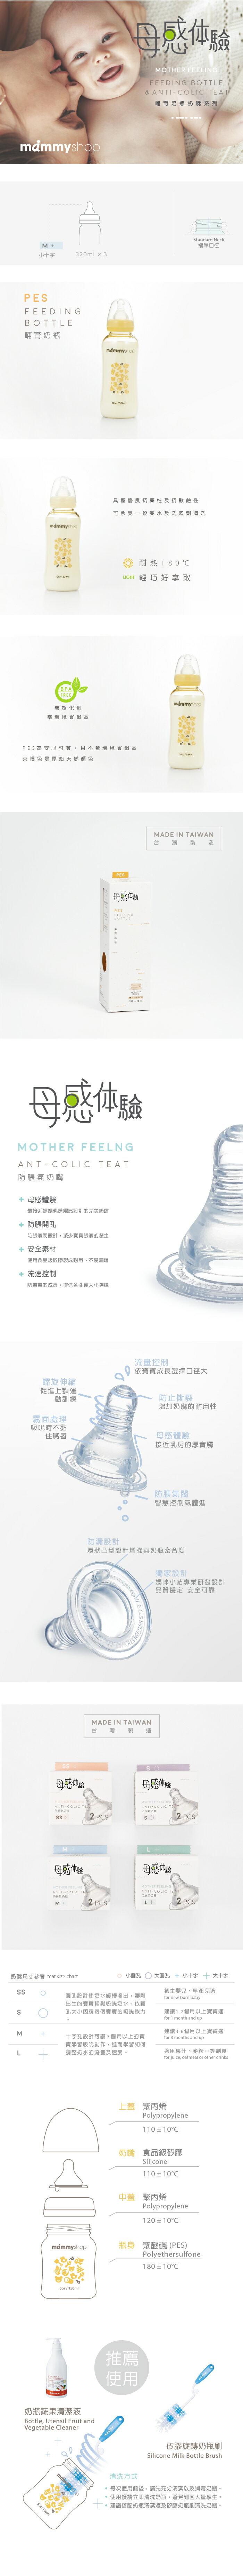 Mammyshop媽咪小站 - 母感體驗 PES防脹氣奶瓶 標準口徑 320ml 3入 超值組 1